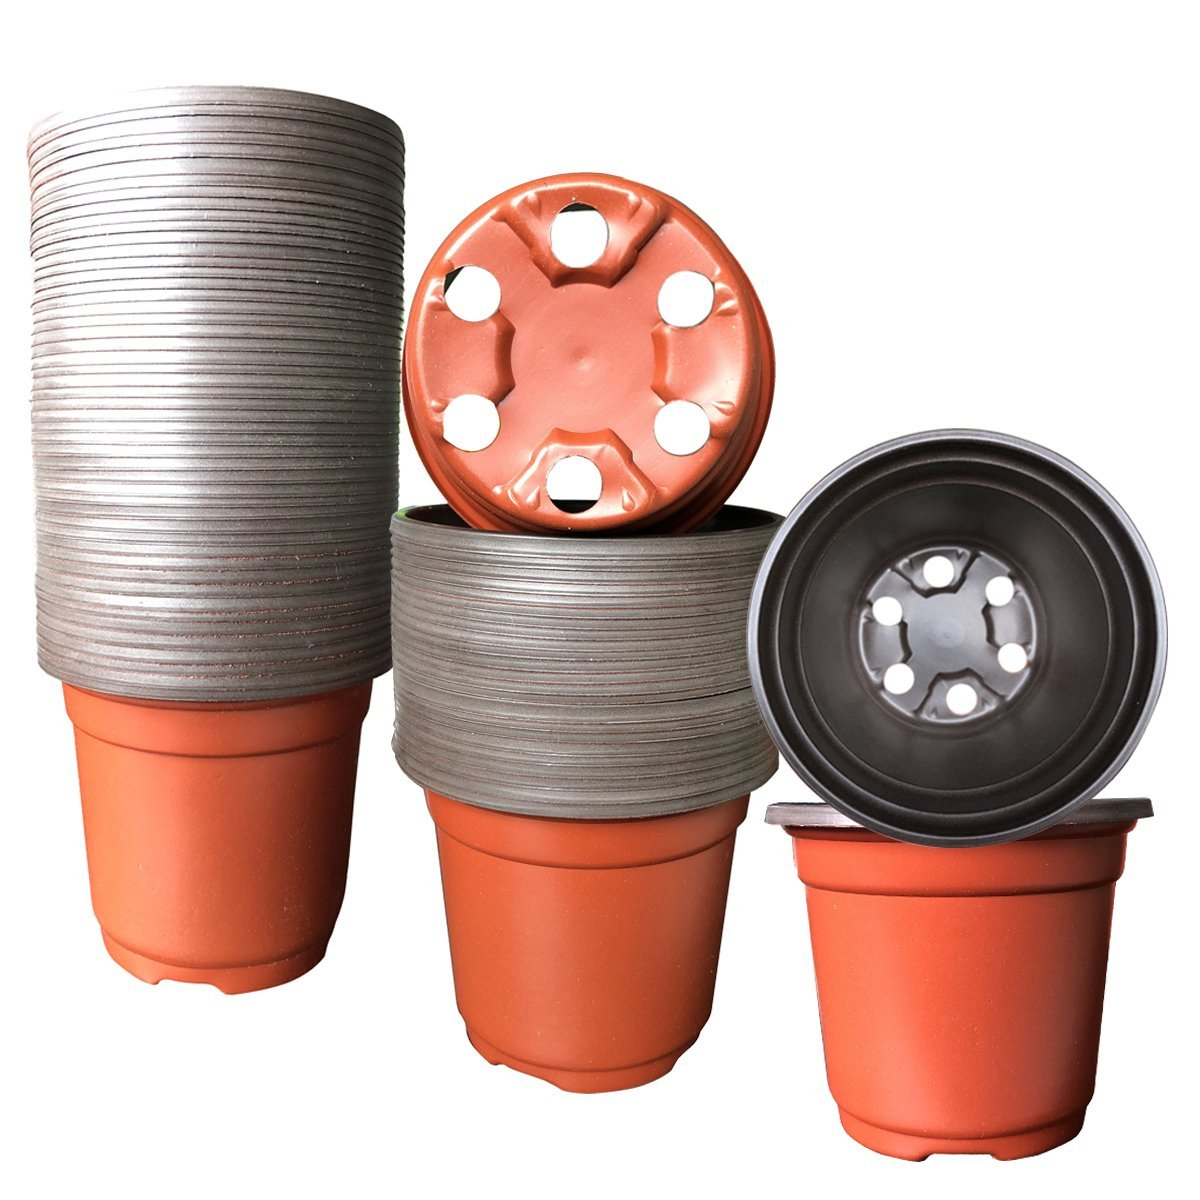 Flower Seedling Nursery Pots 100 Pack Plastic Plant Pot Starter Pot for Seedling Little Garden Pots to Repot Succulents and Small Plants